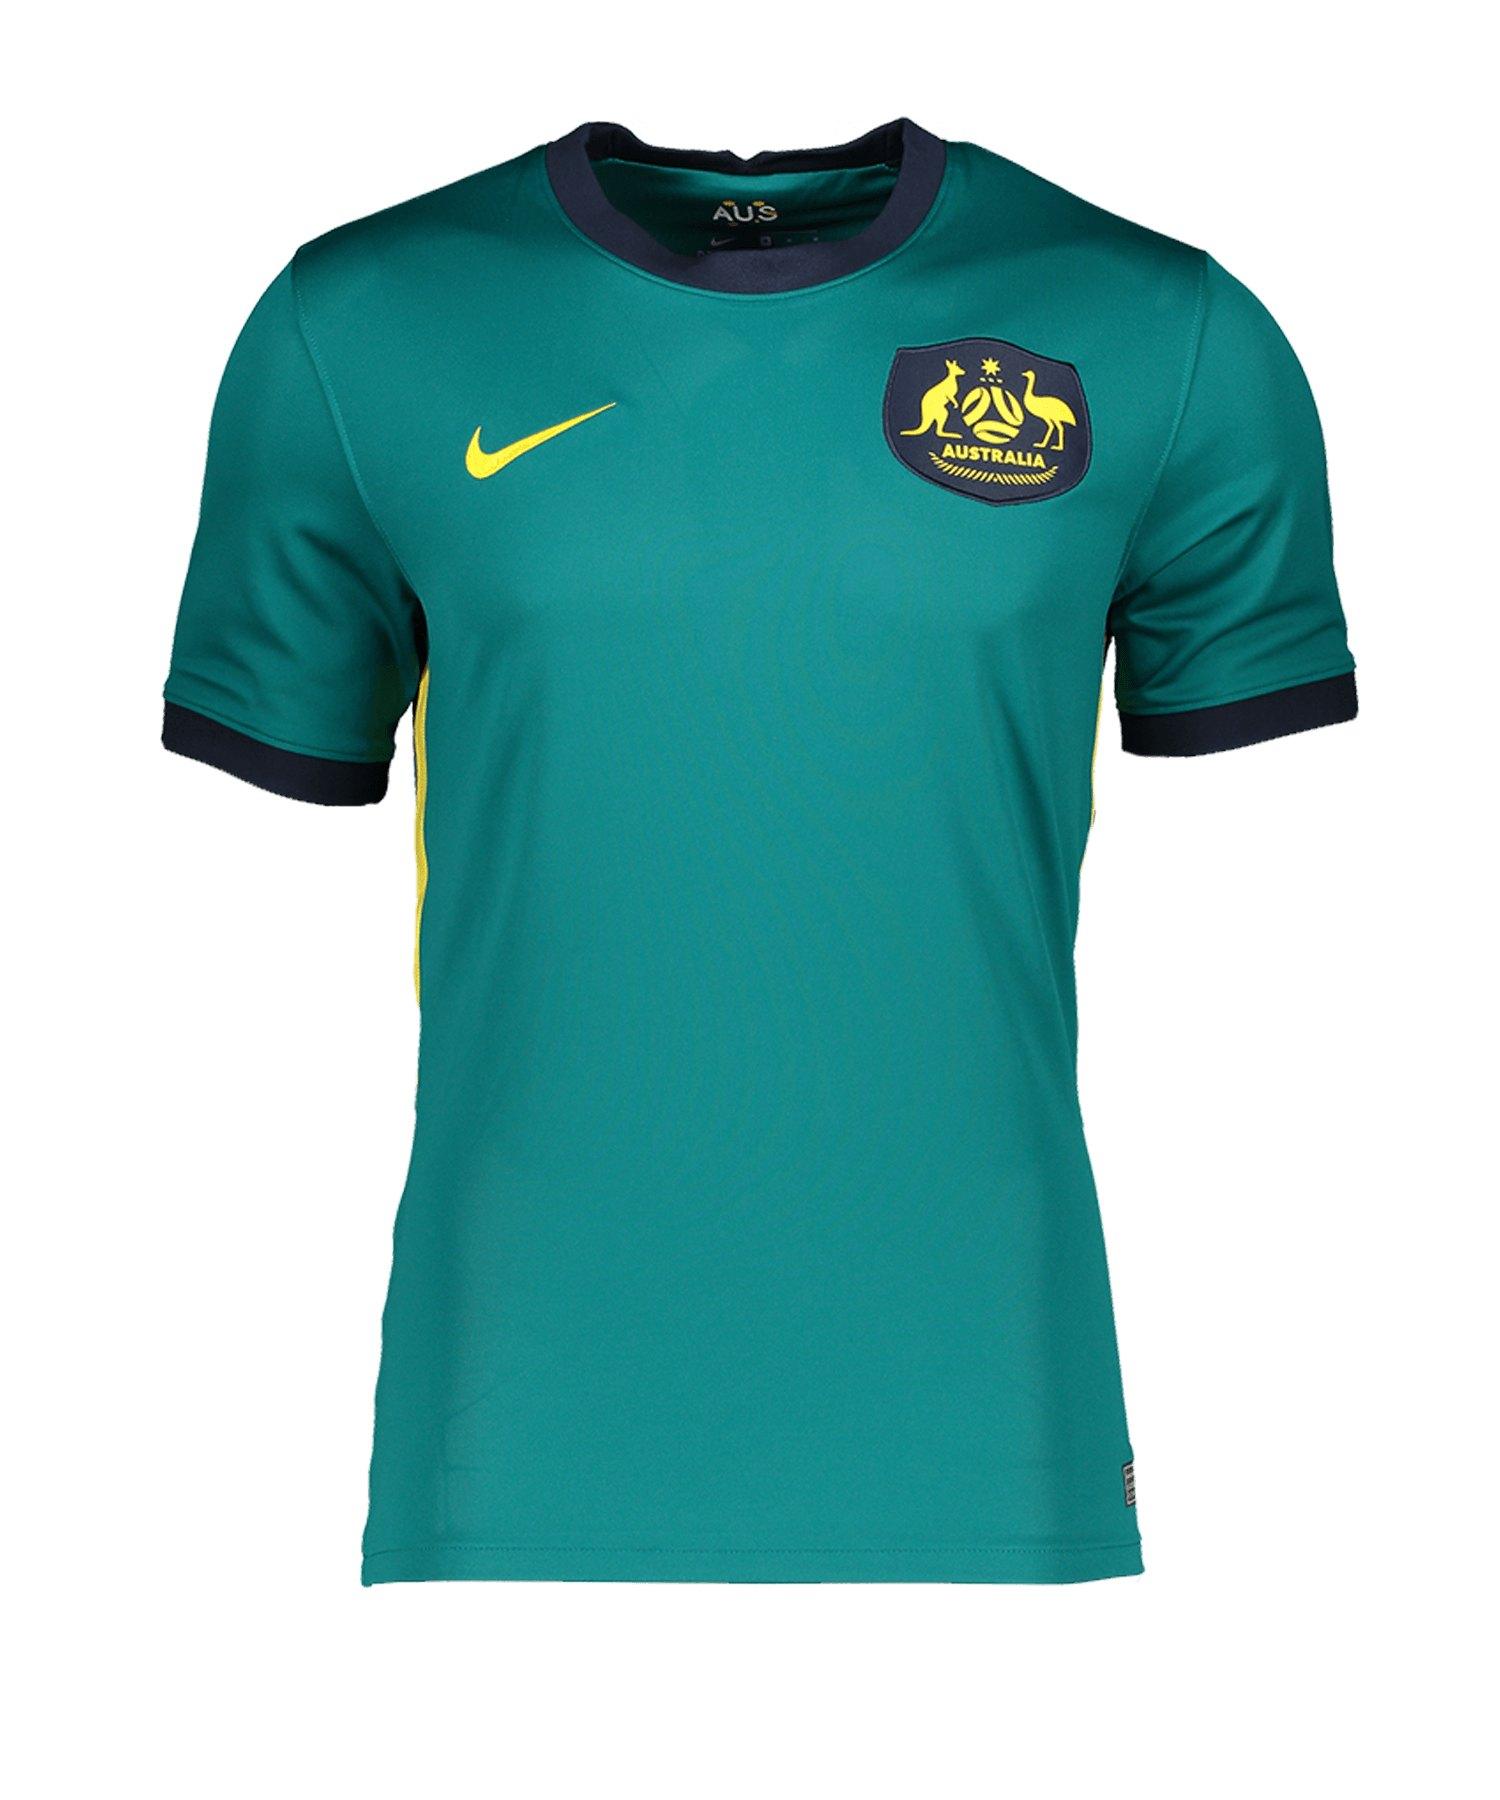 Nike Australien Trikot Away 2020 Grün F356 - blau